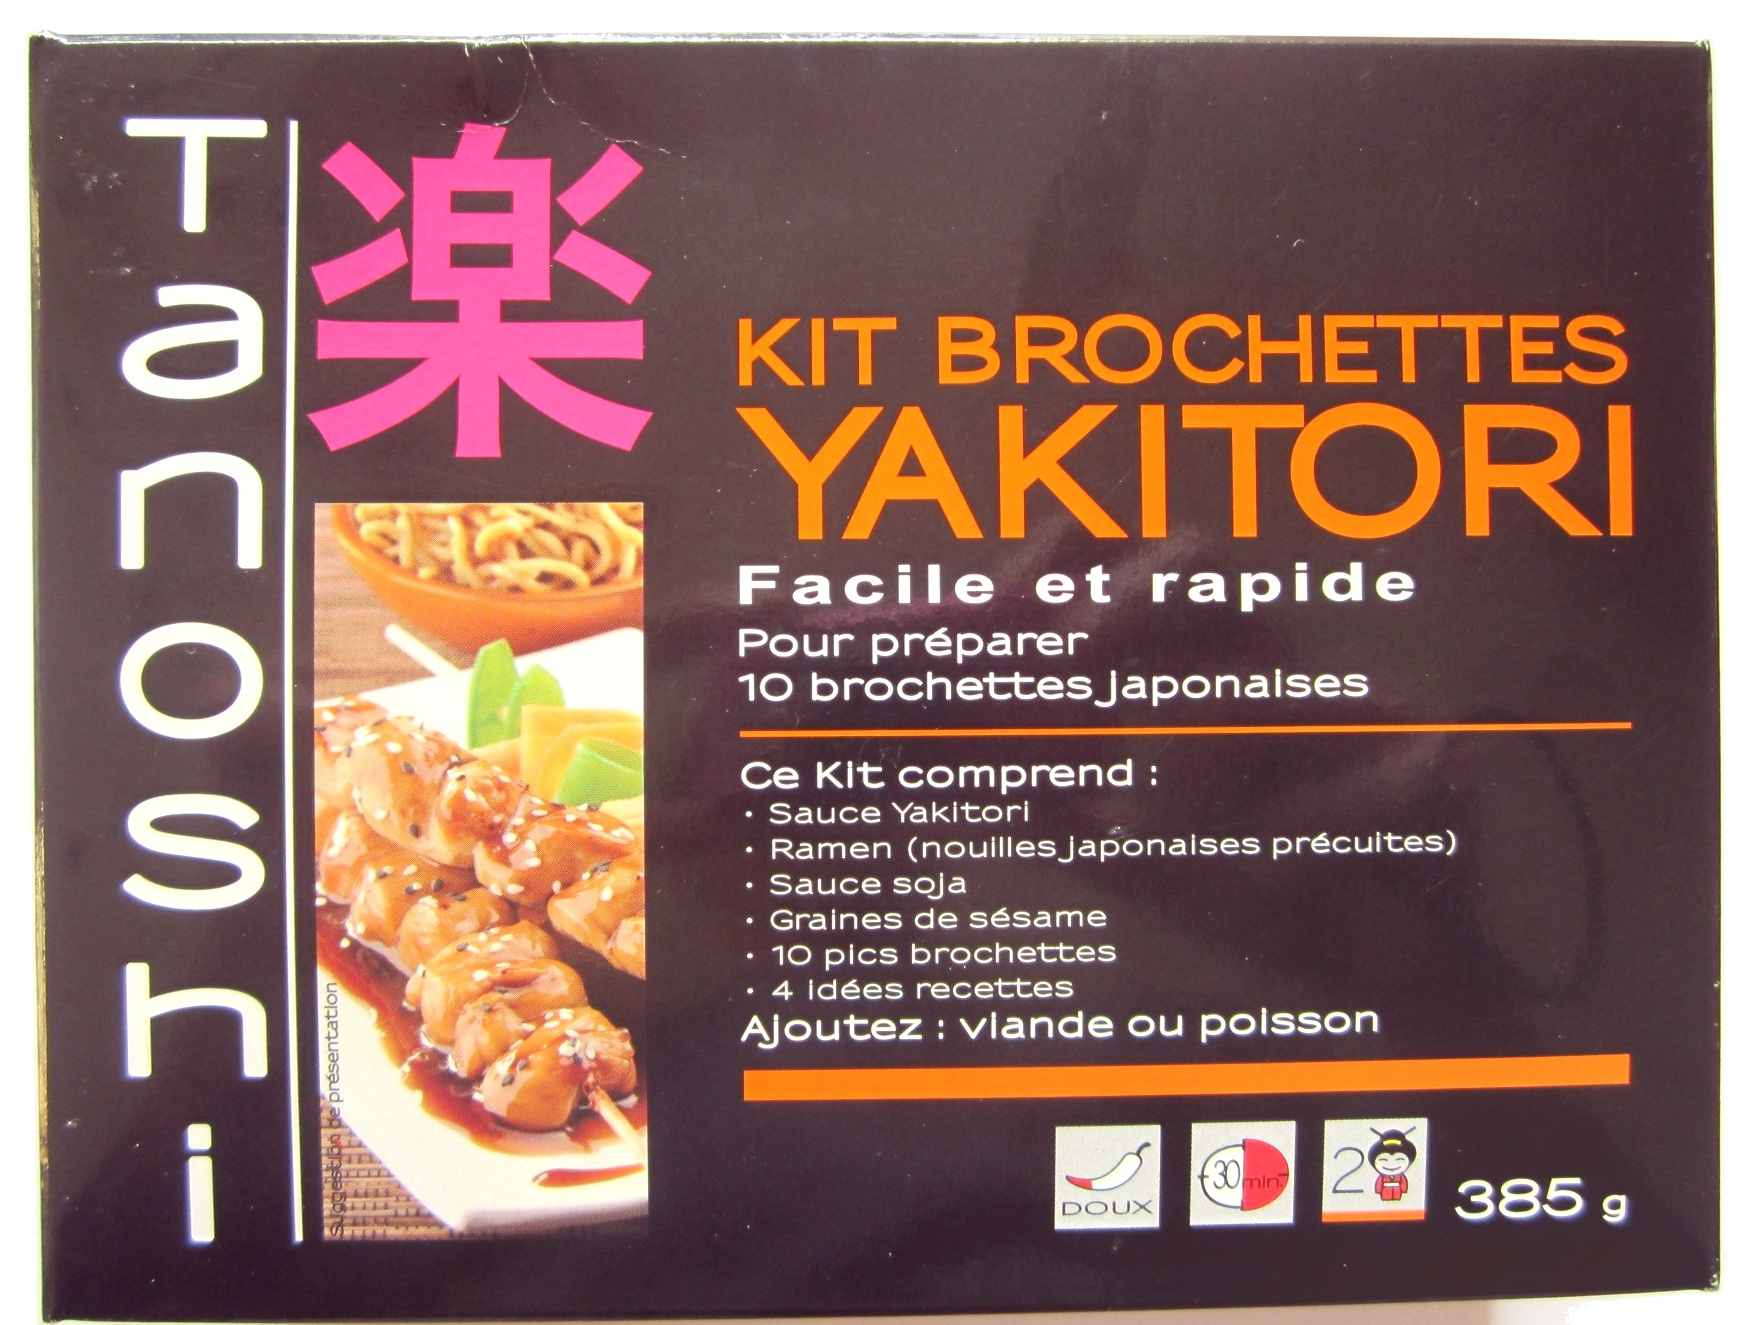 Kit brochettes Yakitori - Produit - fr